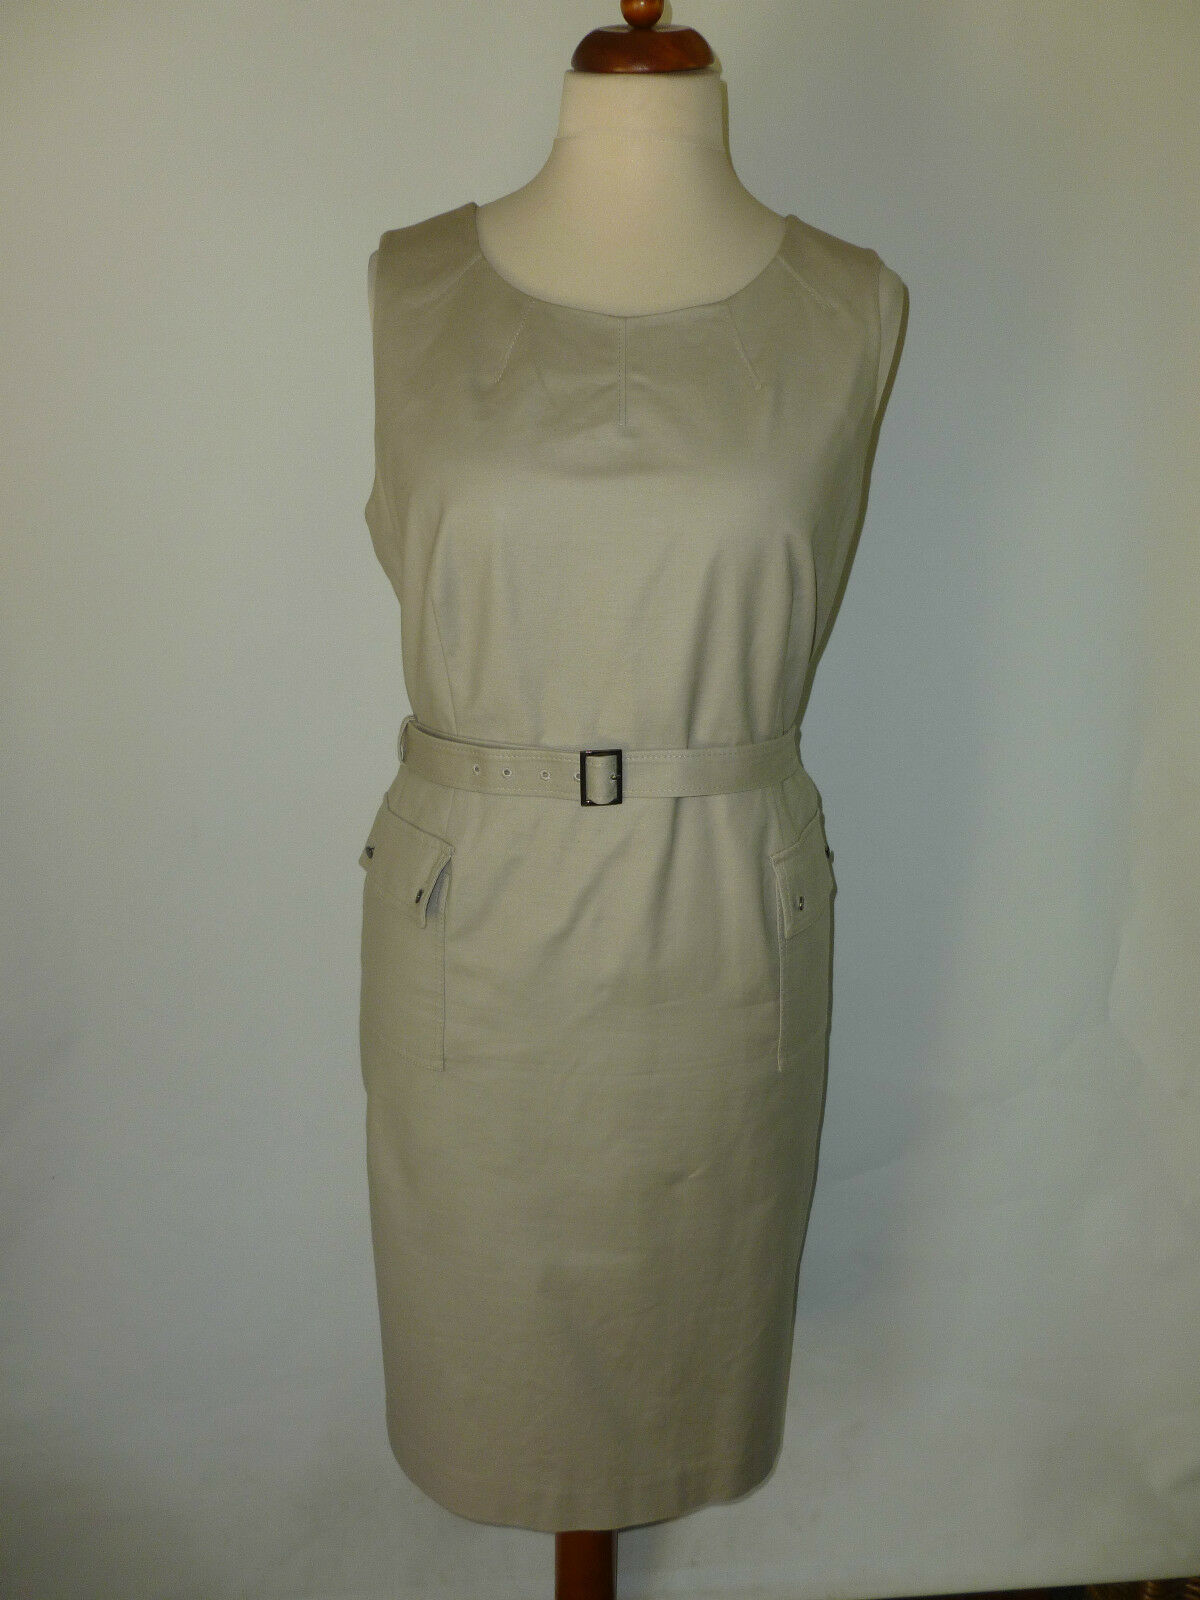 LADIES LINEA  DRESS - SIZE